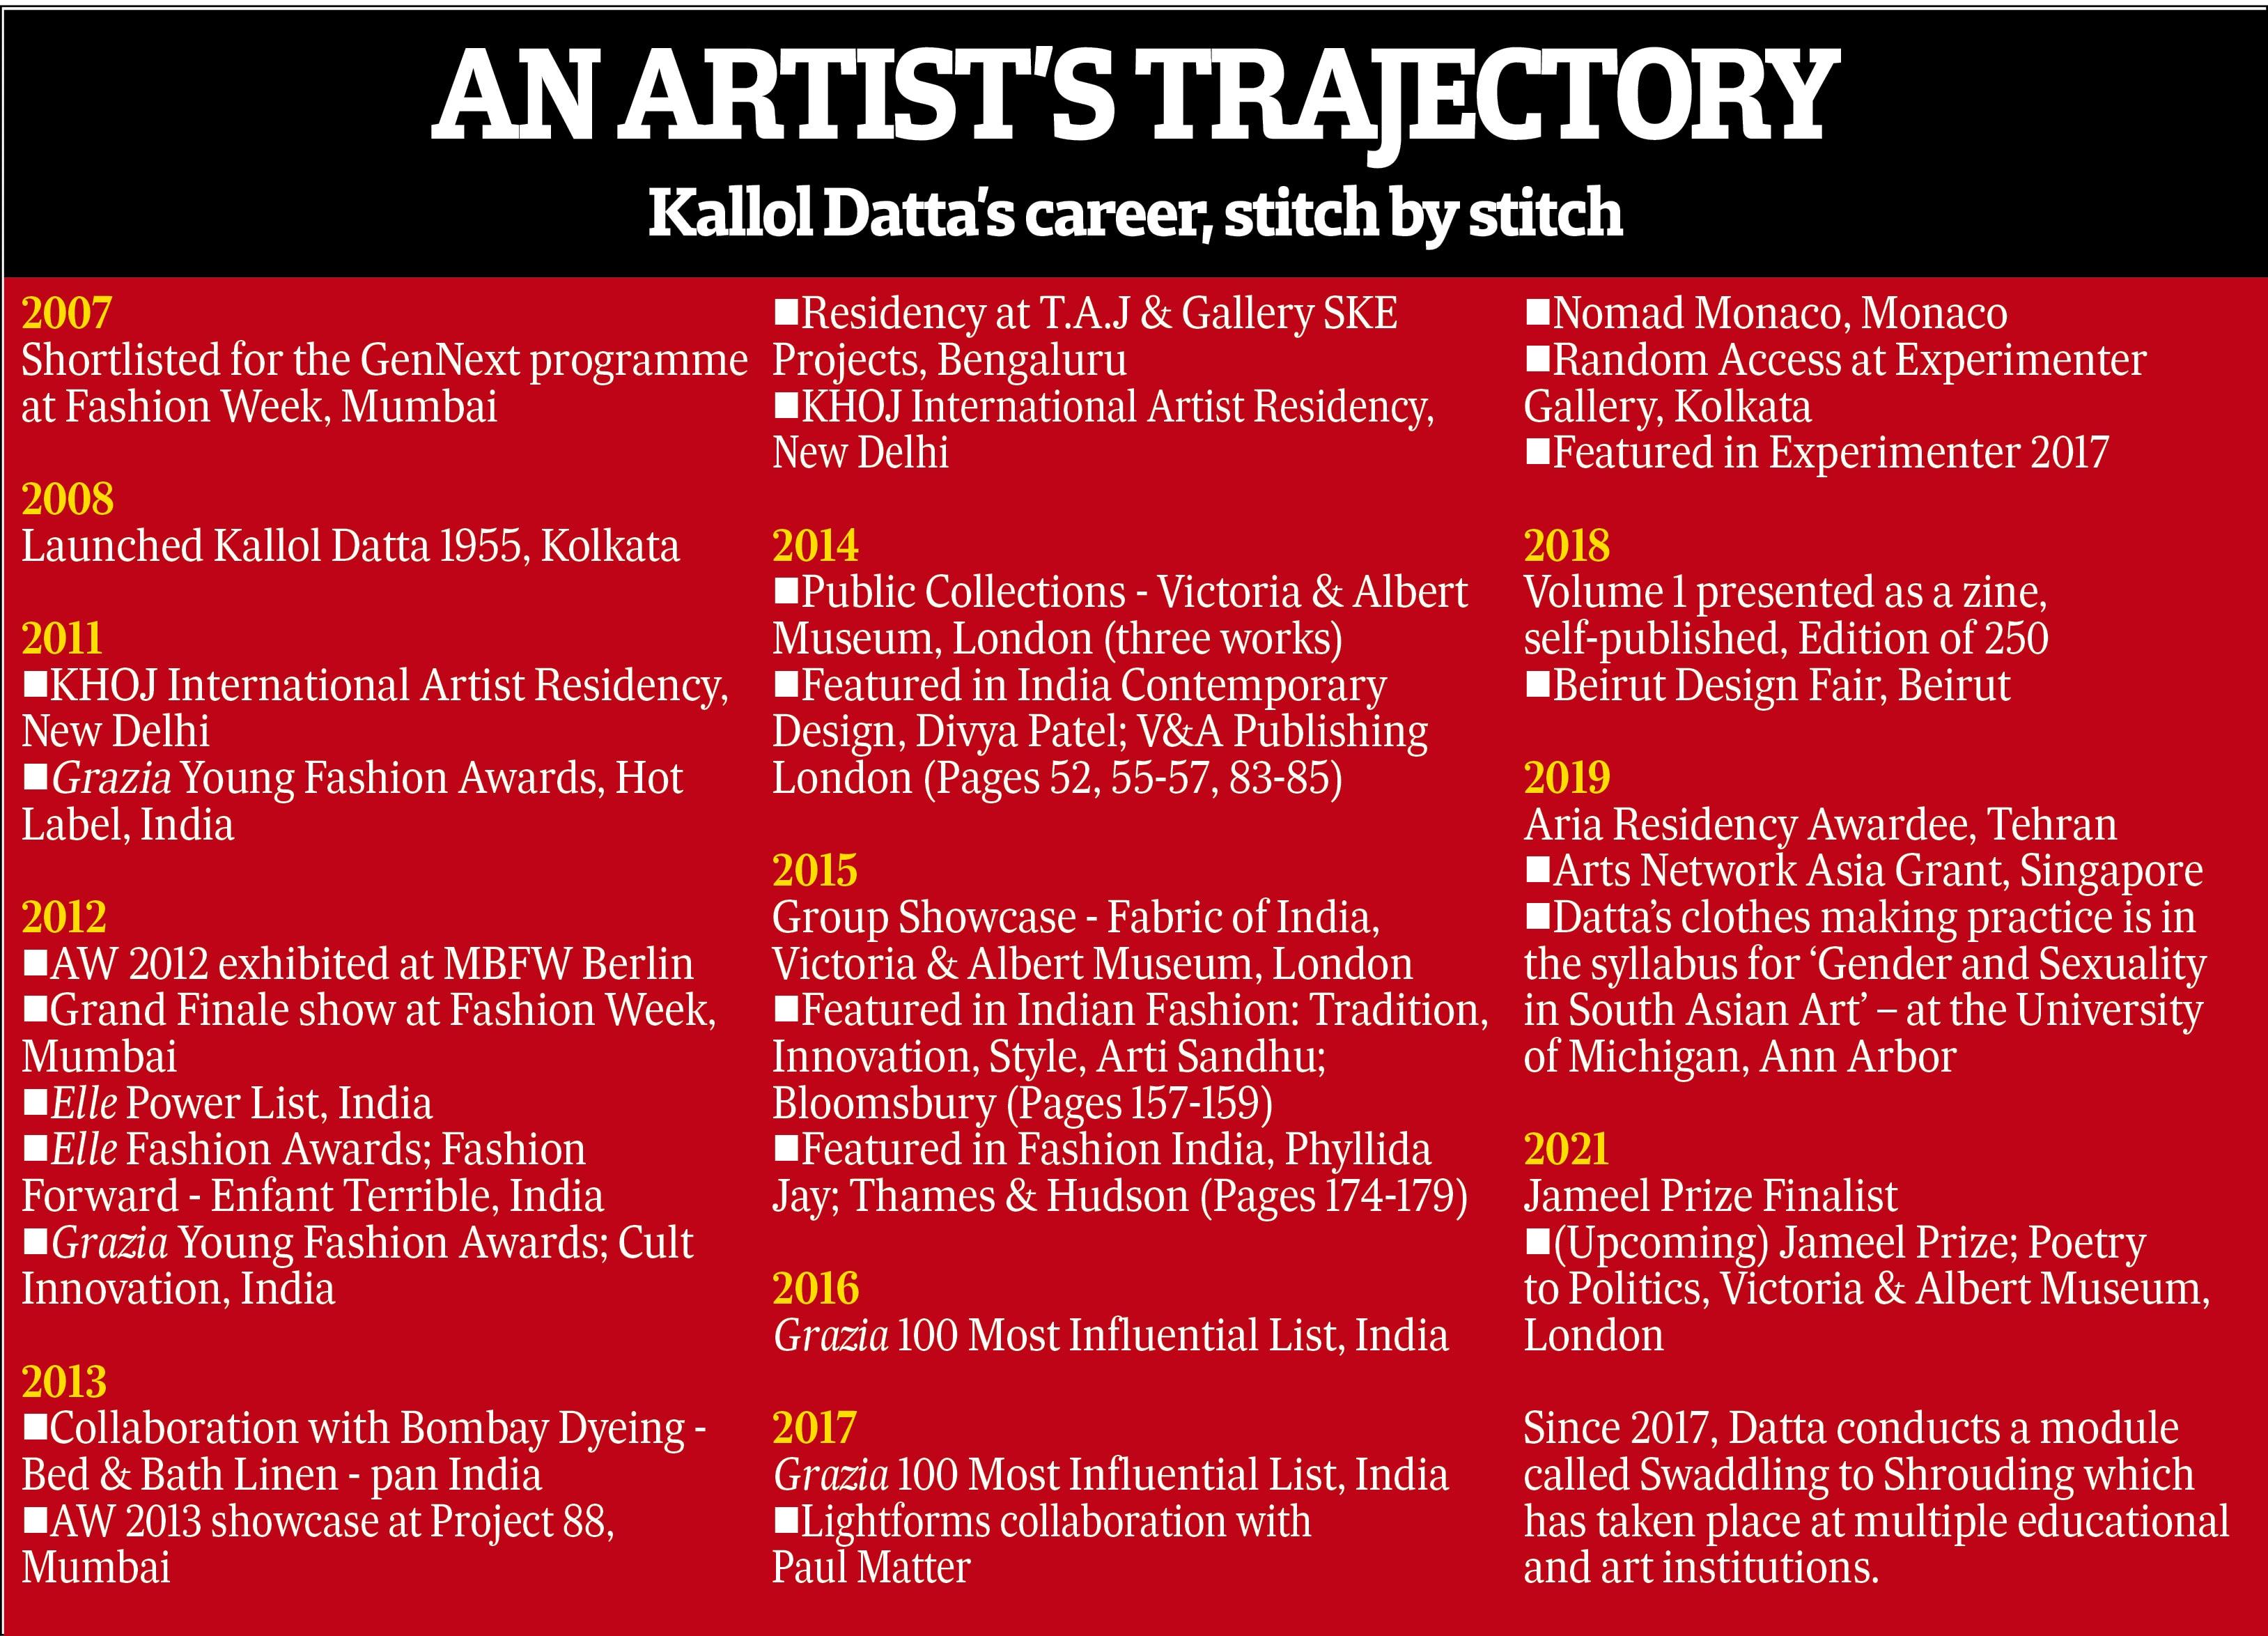 A look at Kallol's career path